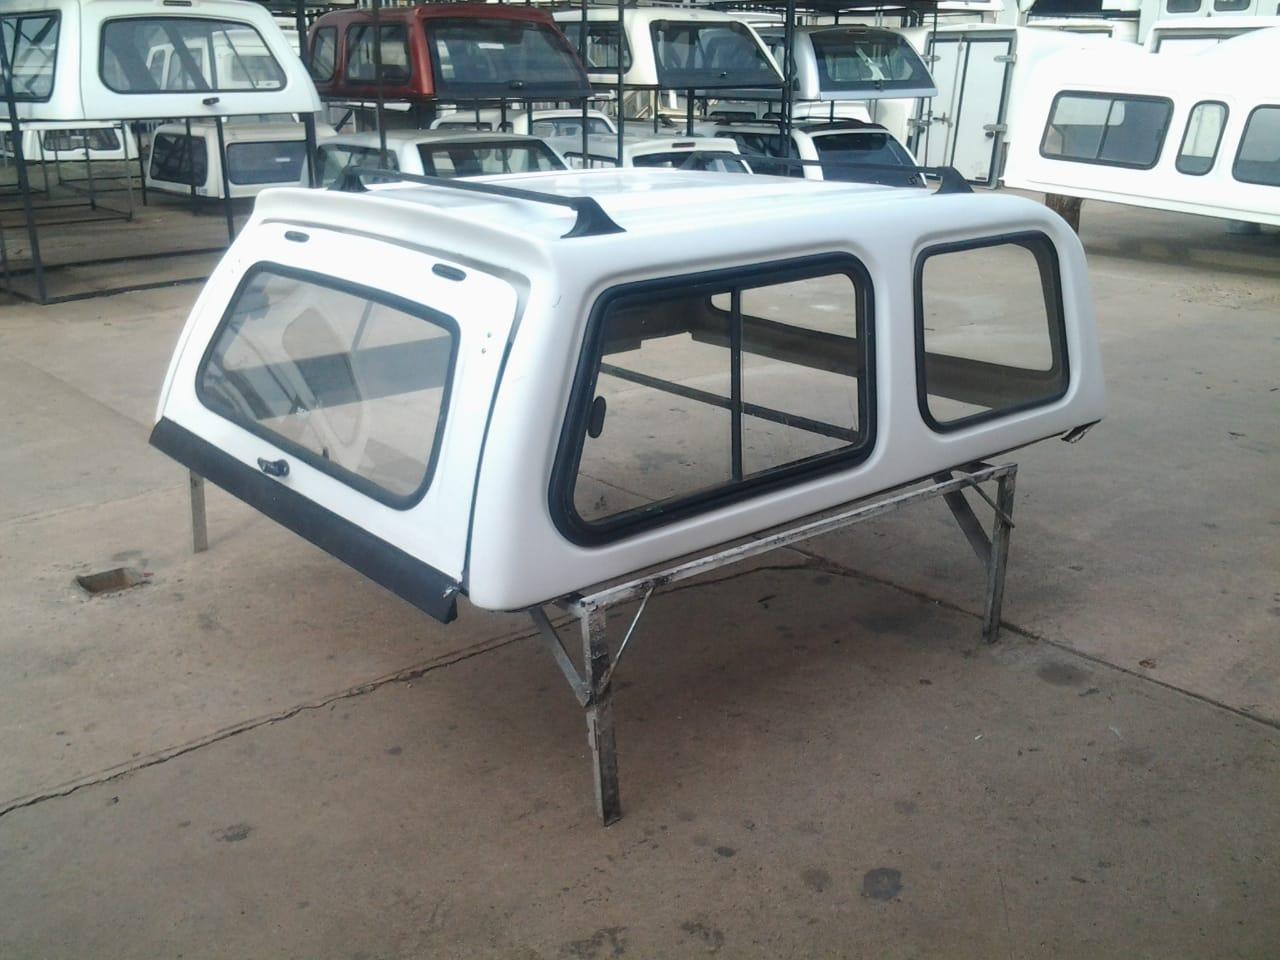 2006 Mazda Drifter - Ford Ranger SA Super cab Refurbished  Canopy for sale!!